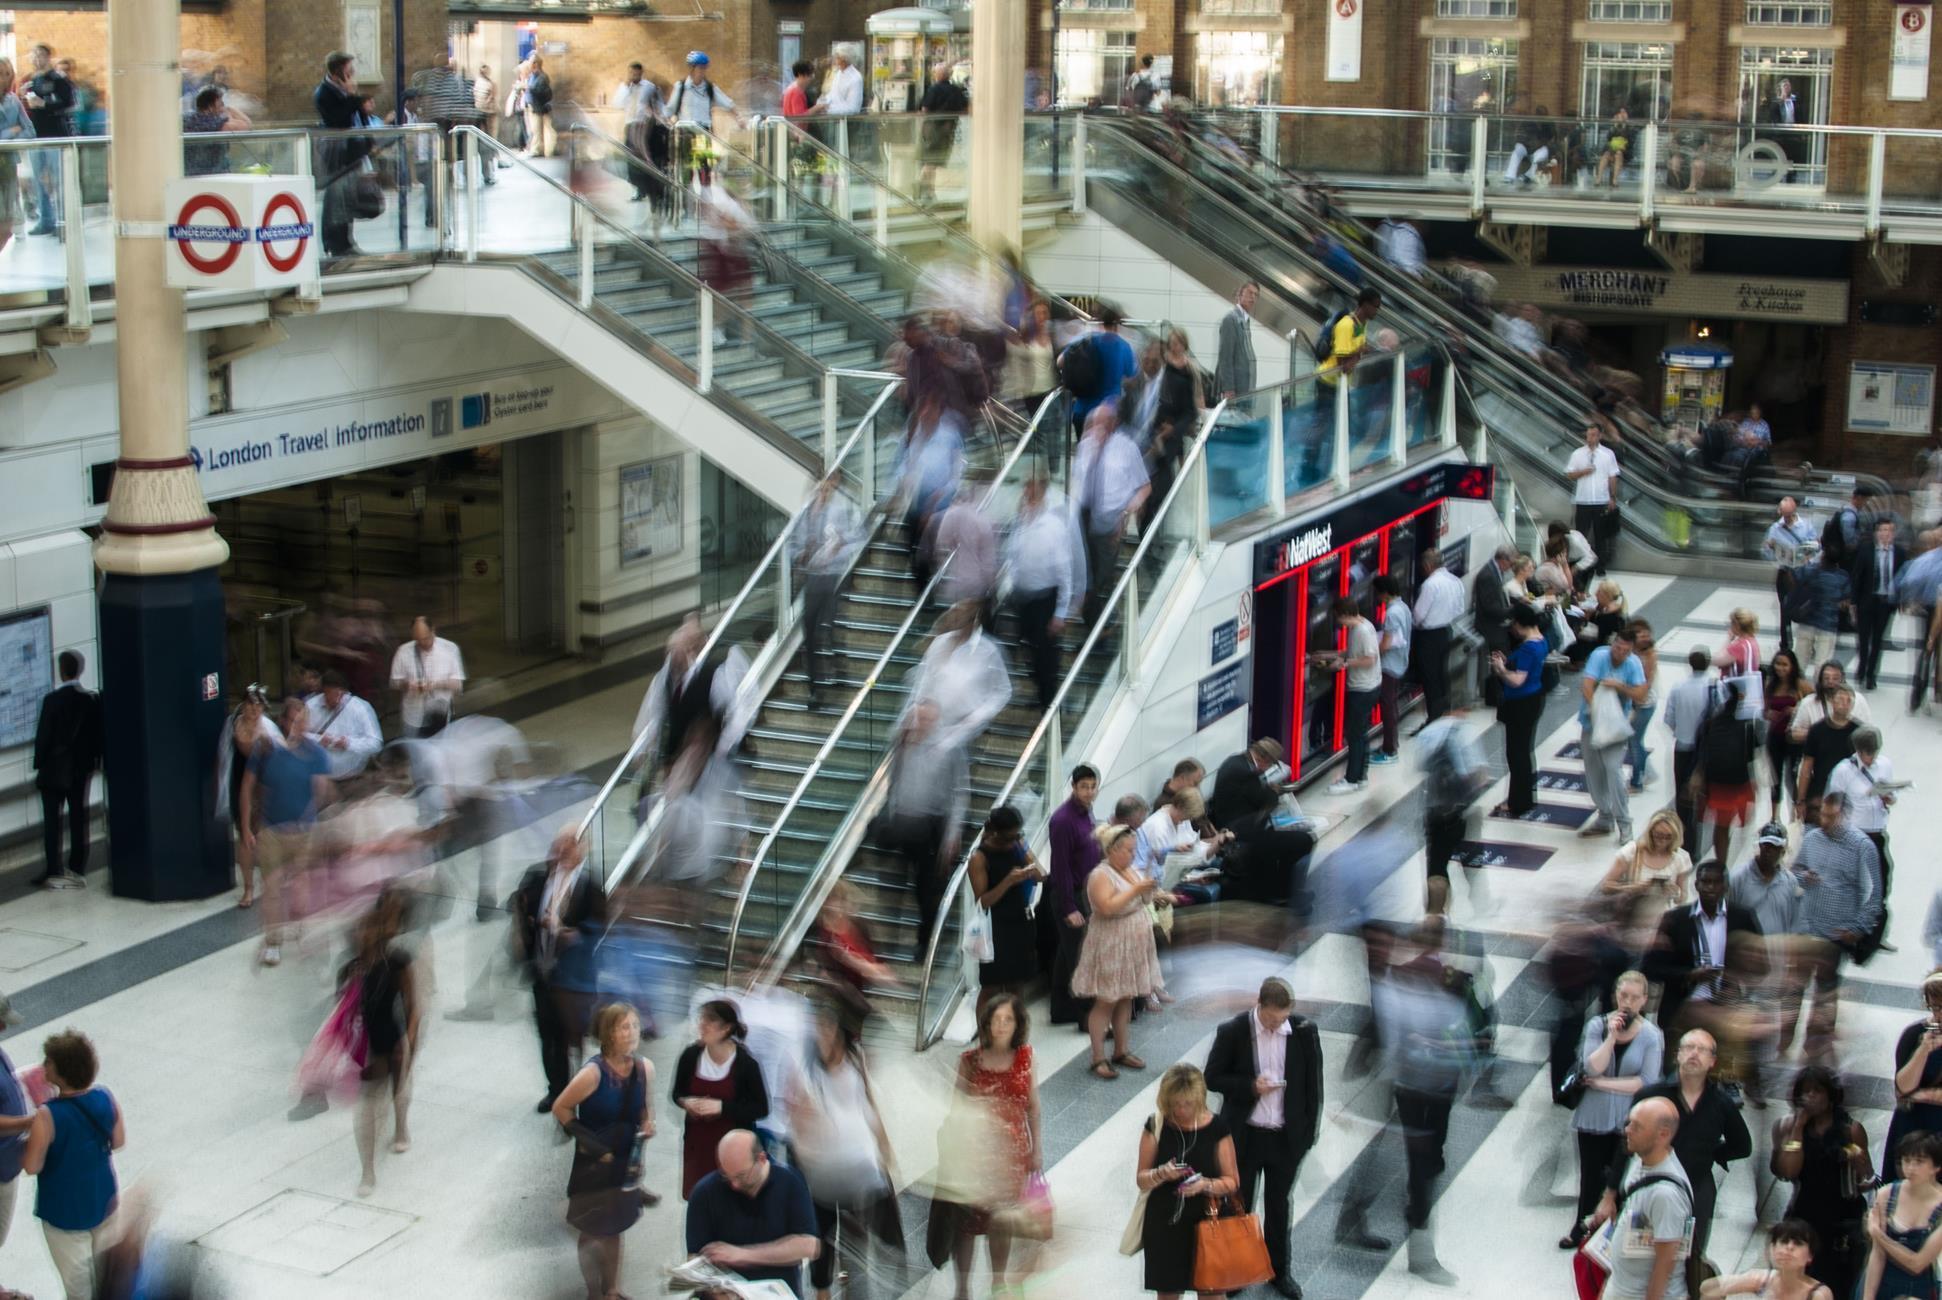 London's Liverpool Street station